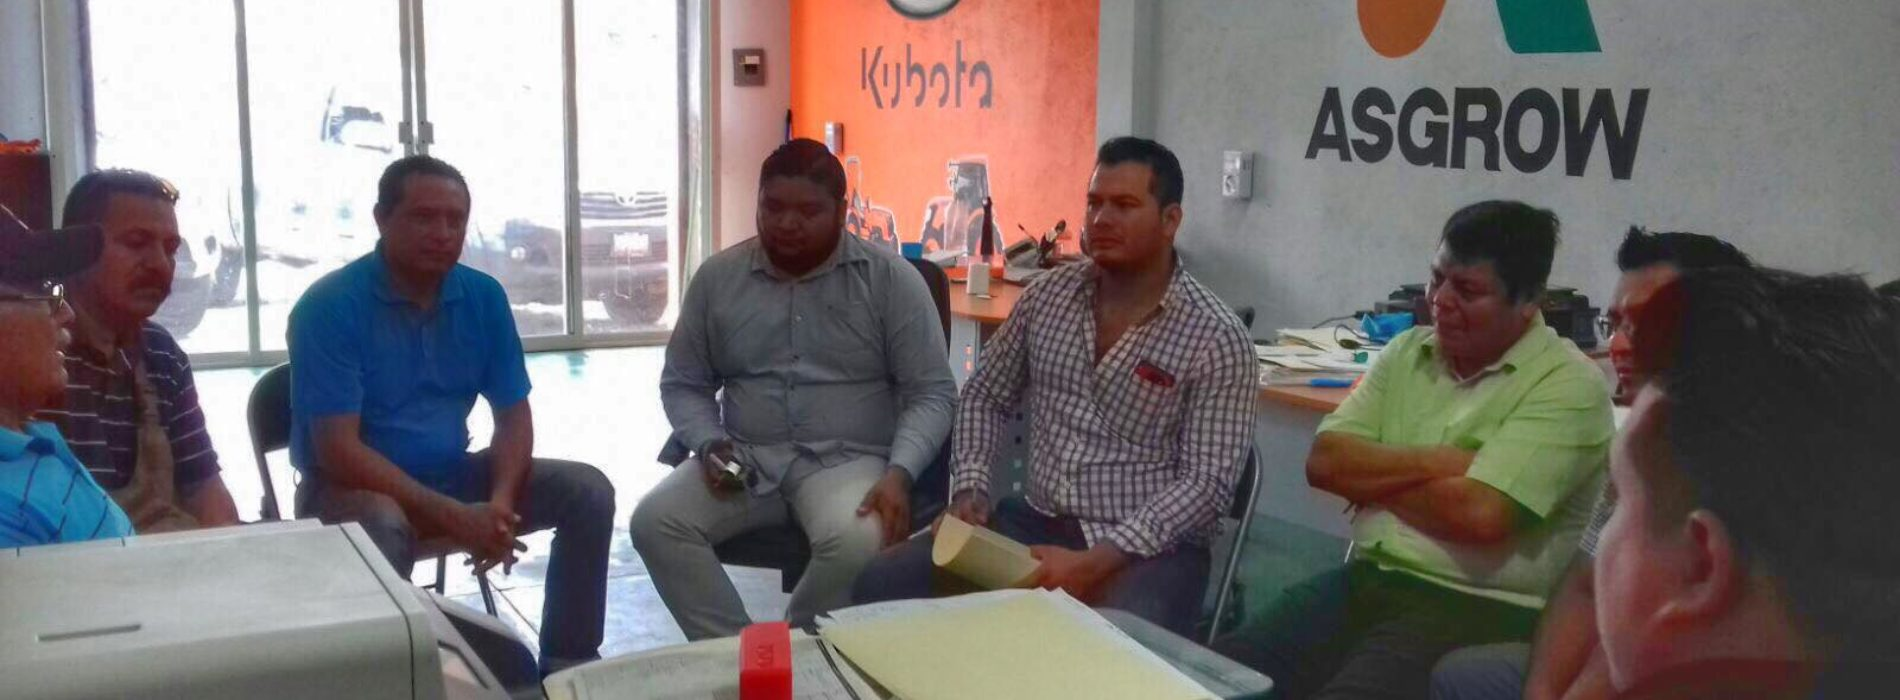 """POR UN NILTEPEC PRODUCTIVO"", REUNIÓN CON DIRECTORES DE DESARROLLO AGROPECUARIO"